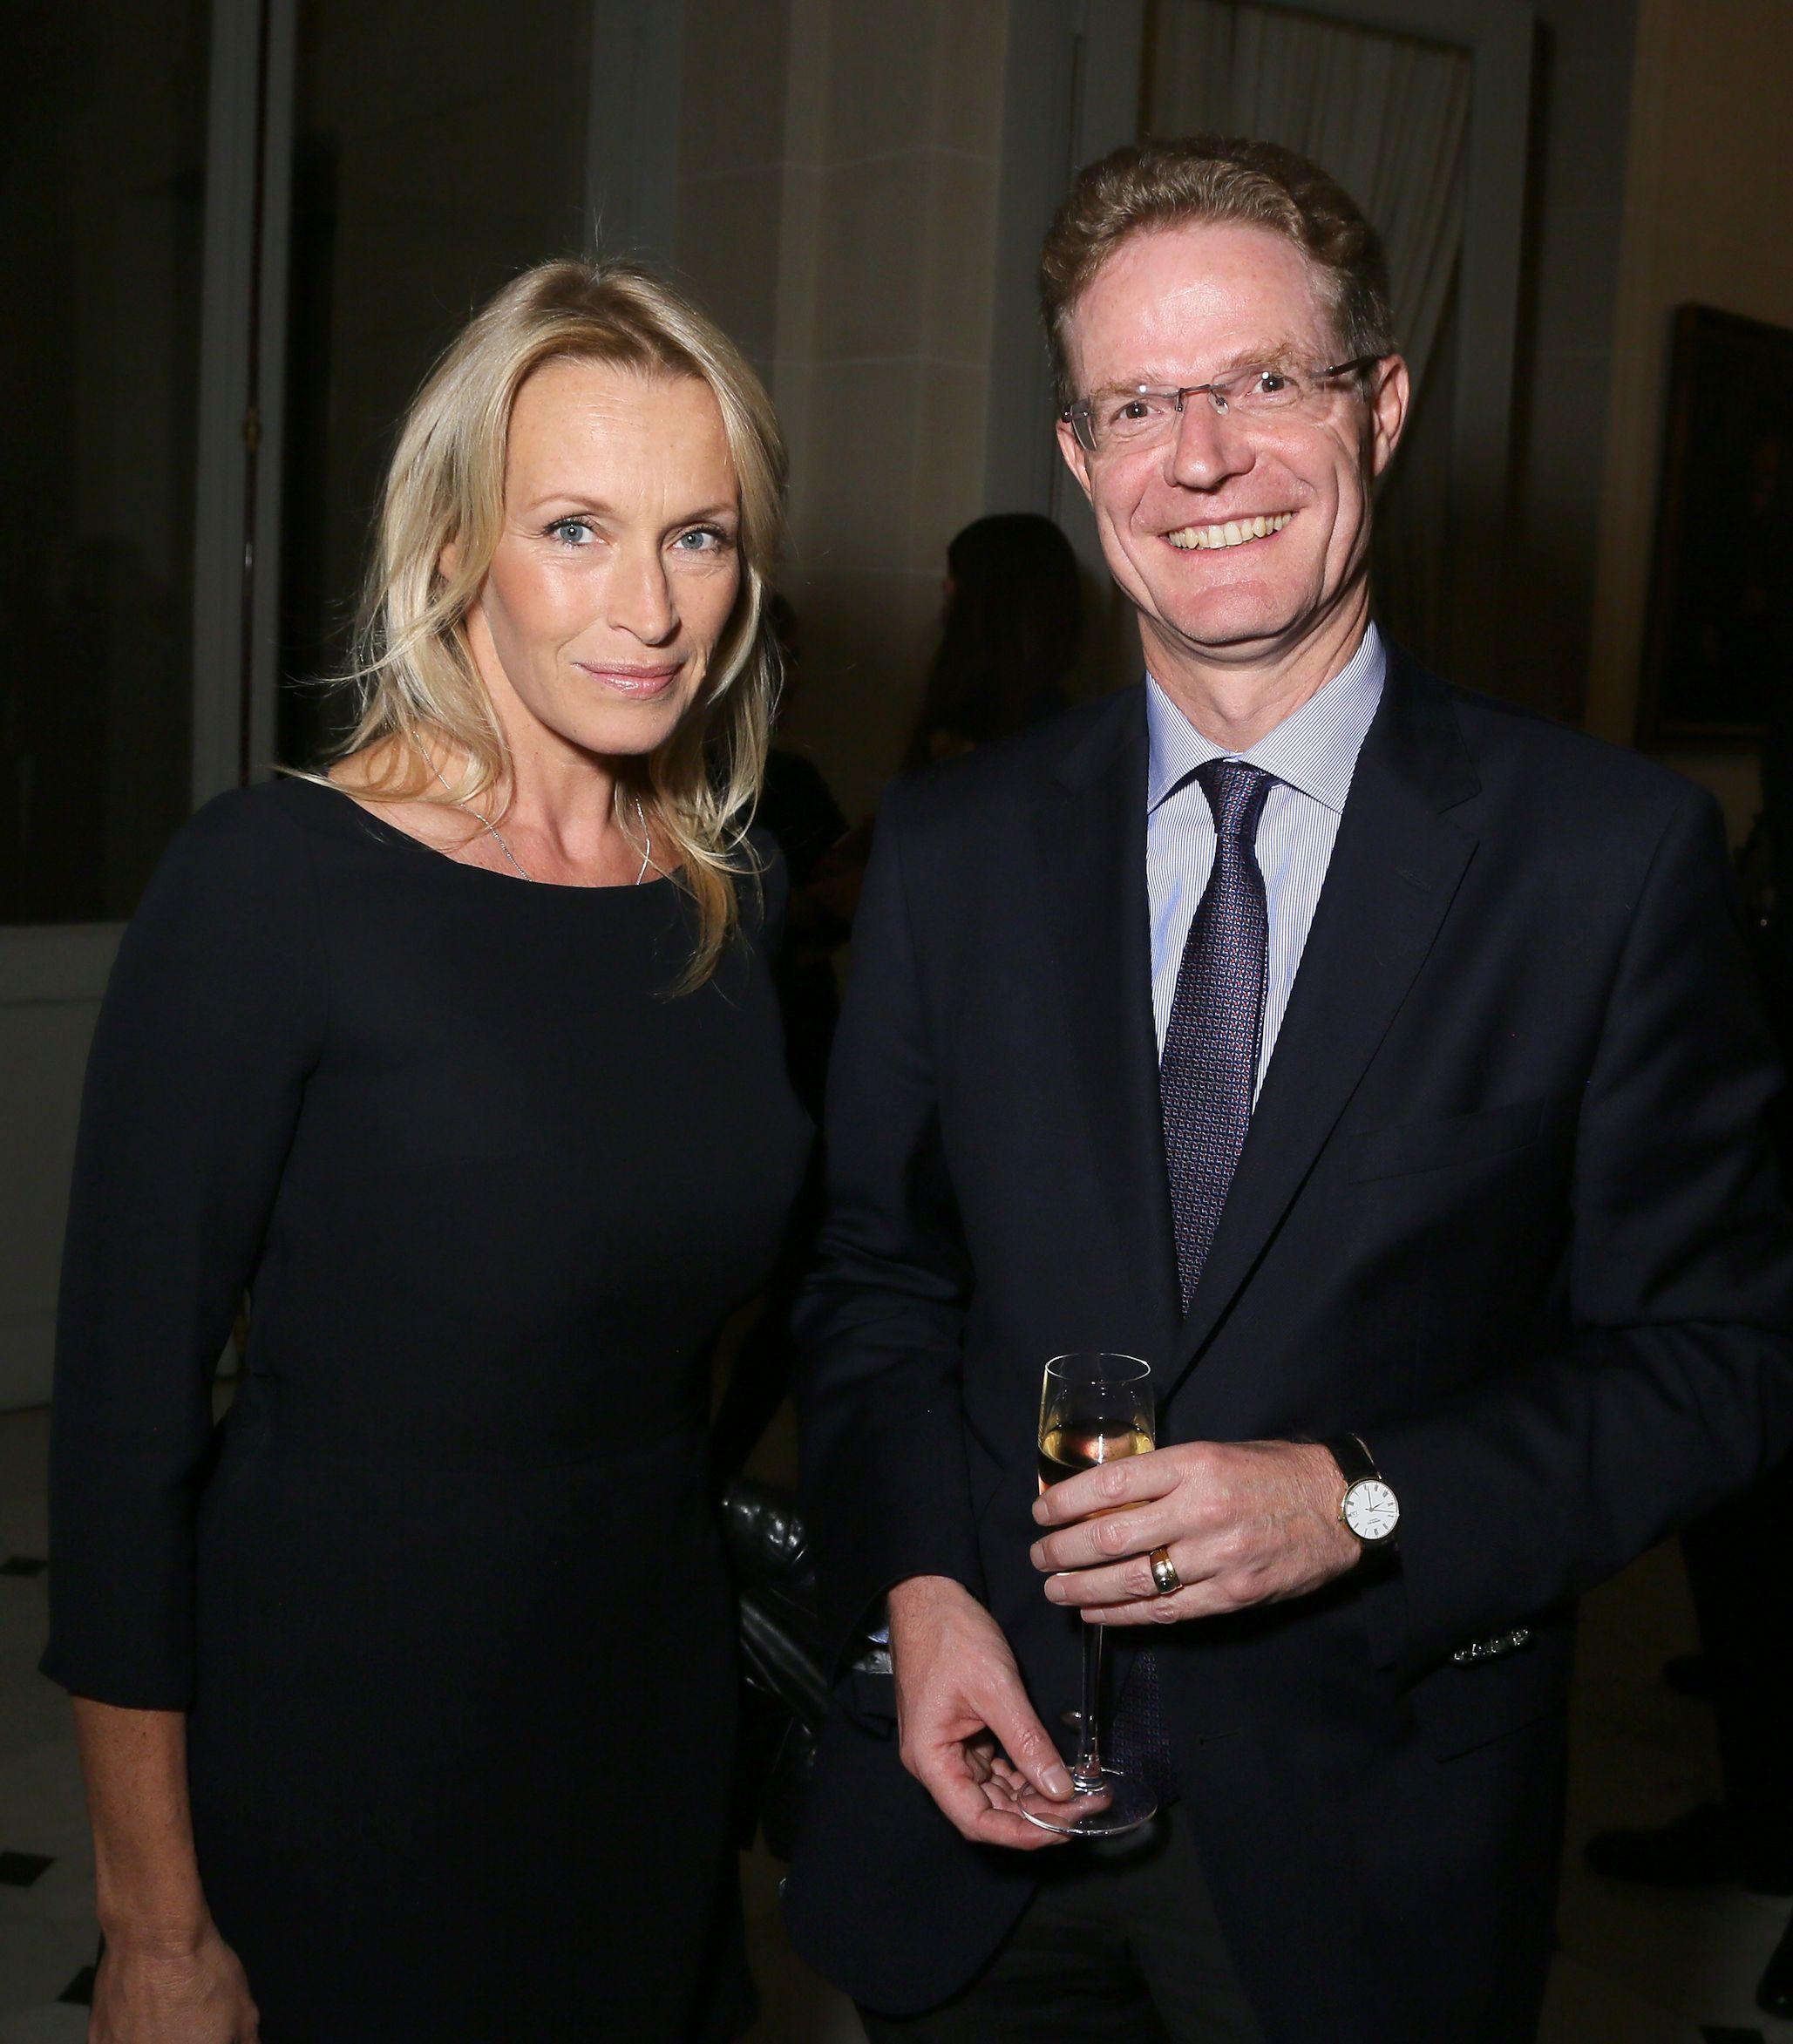 Estelle Lefebure and Nikolaus Meyer-Landrut attend Der Berliner Mode Salon